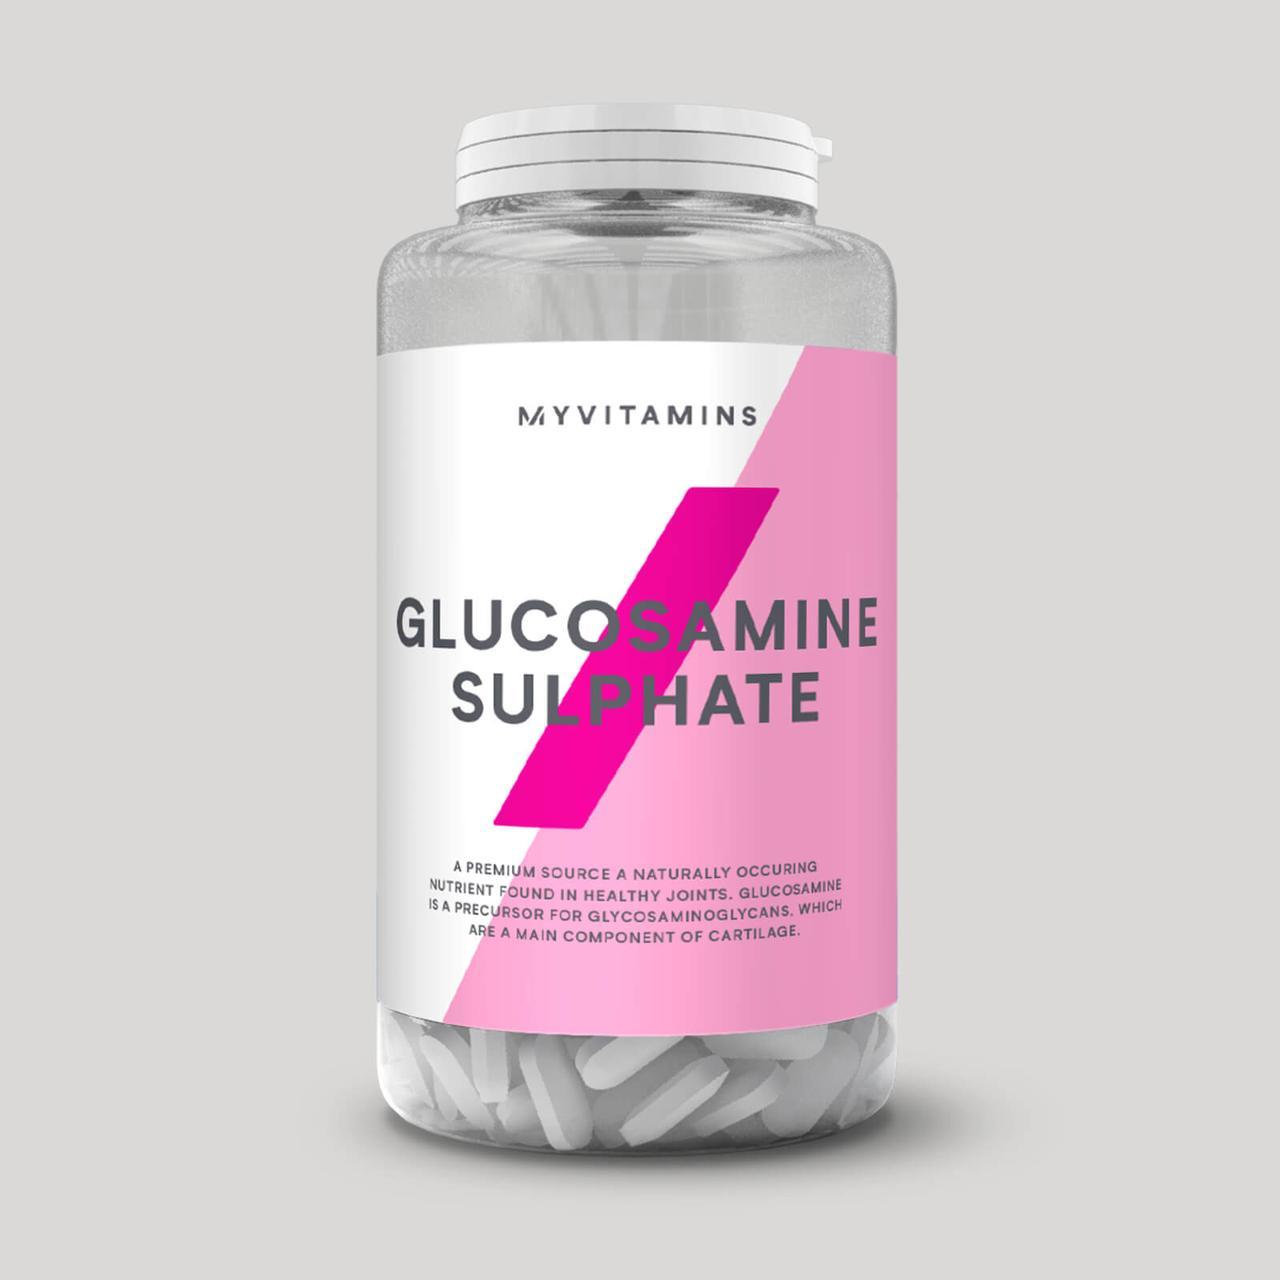 Glucosamine Sulphate MyProtein 120 tabs